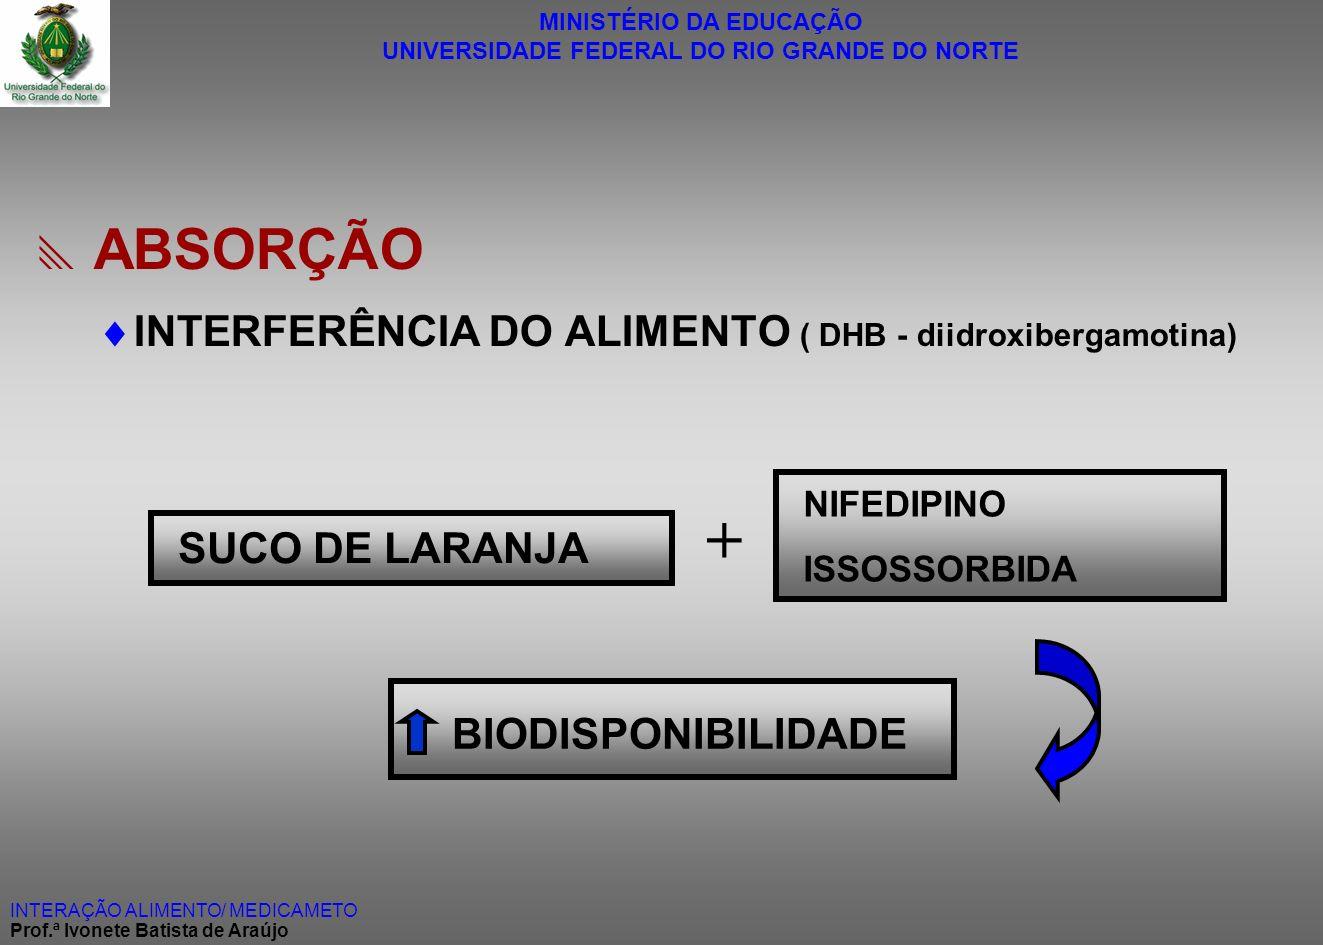 +  ABSORÇÃO INTERFERÊNCIA DO ALIMENTO ( DHB - diidroxibergamotina)